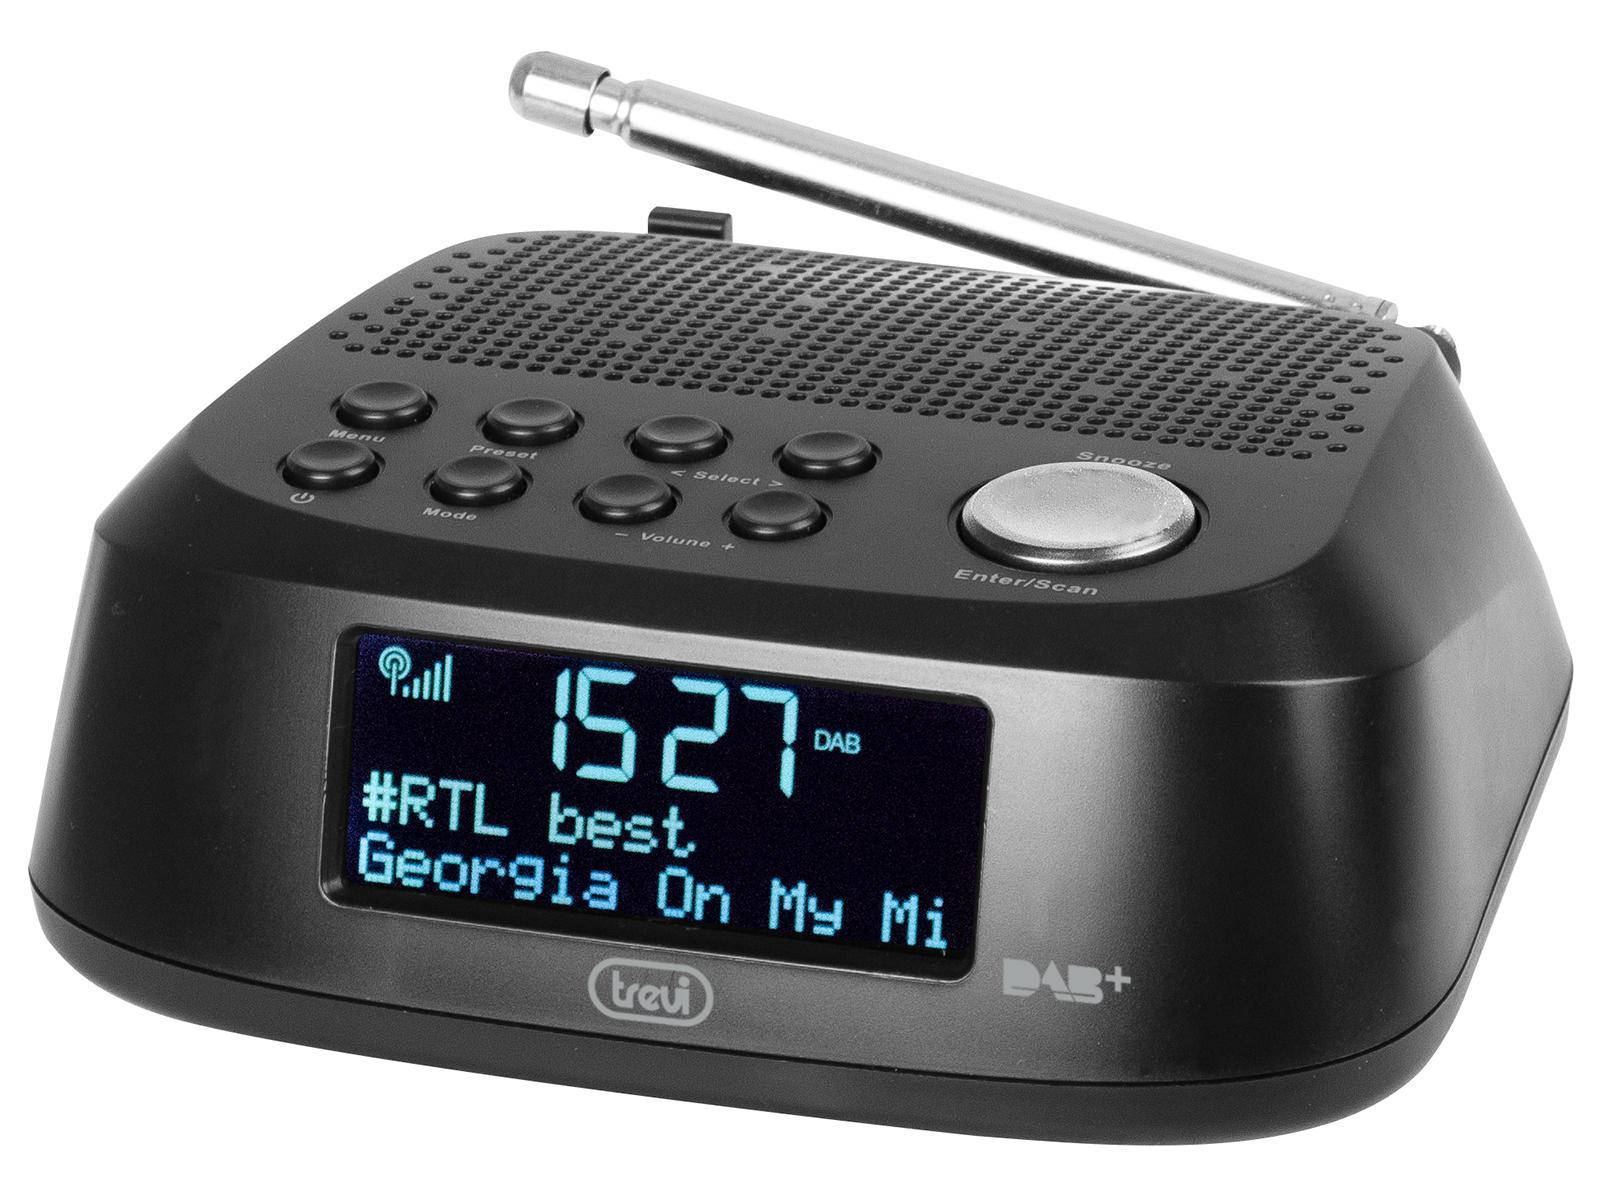 Trevi RC 80D4 DAB radio Orologio Digitale Nero